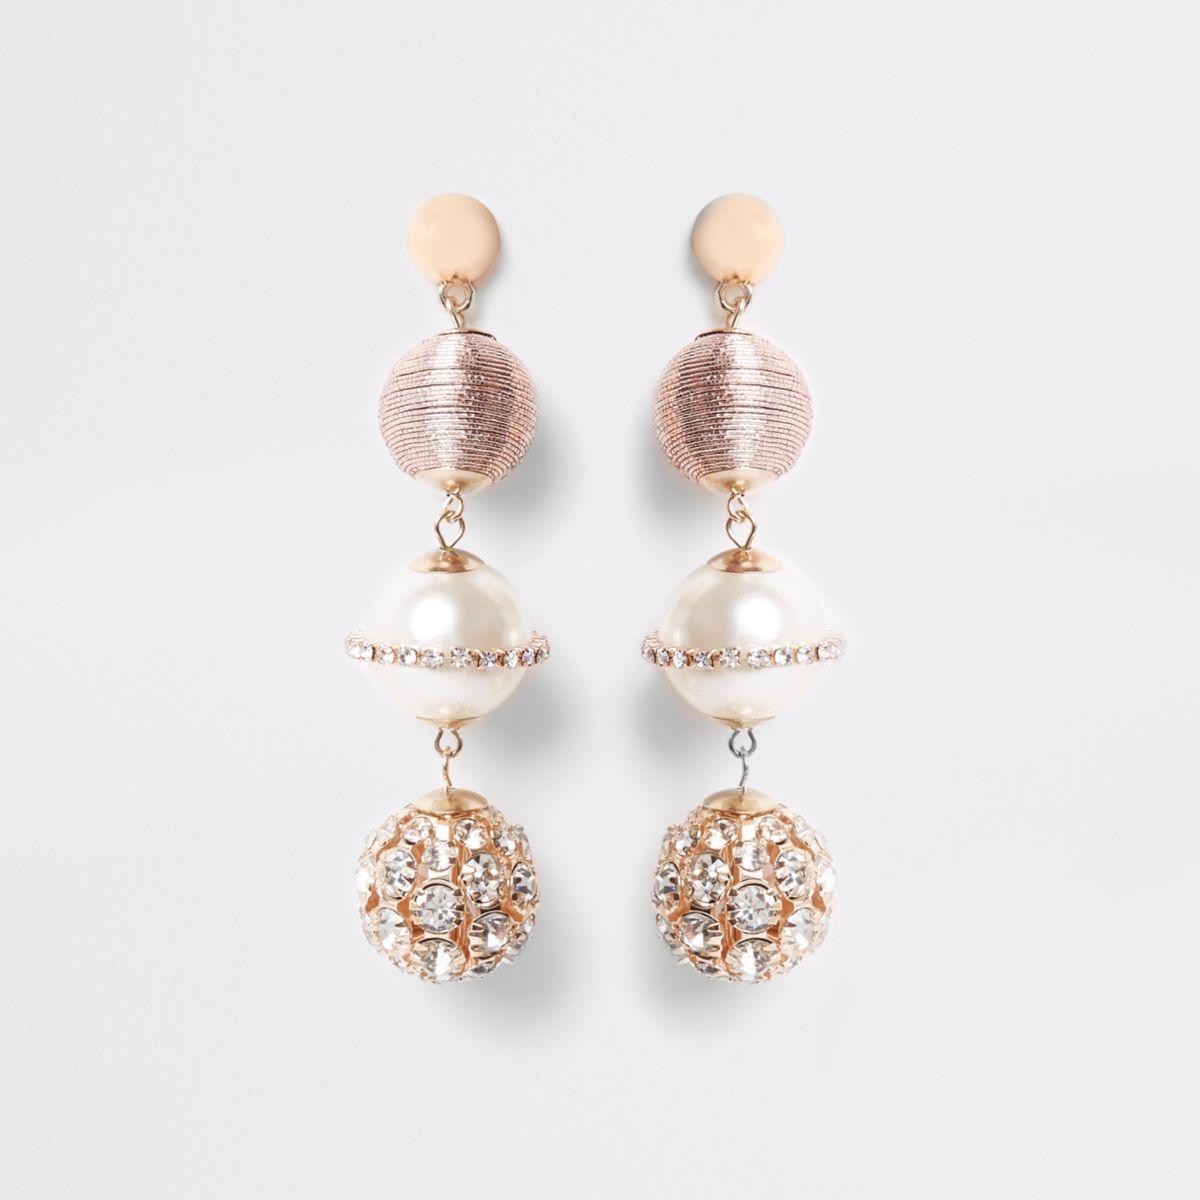 Pink rhinestone wrapped globe drop earrings